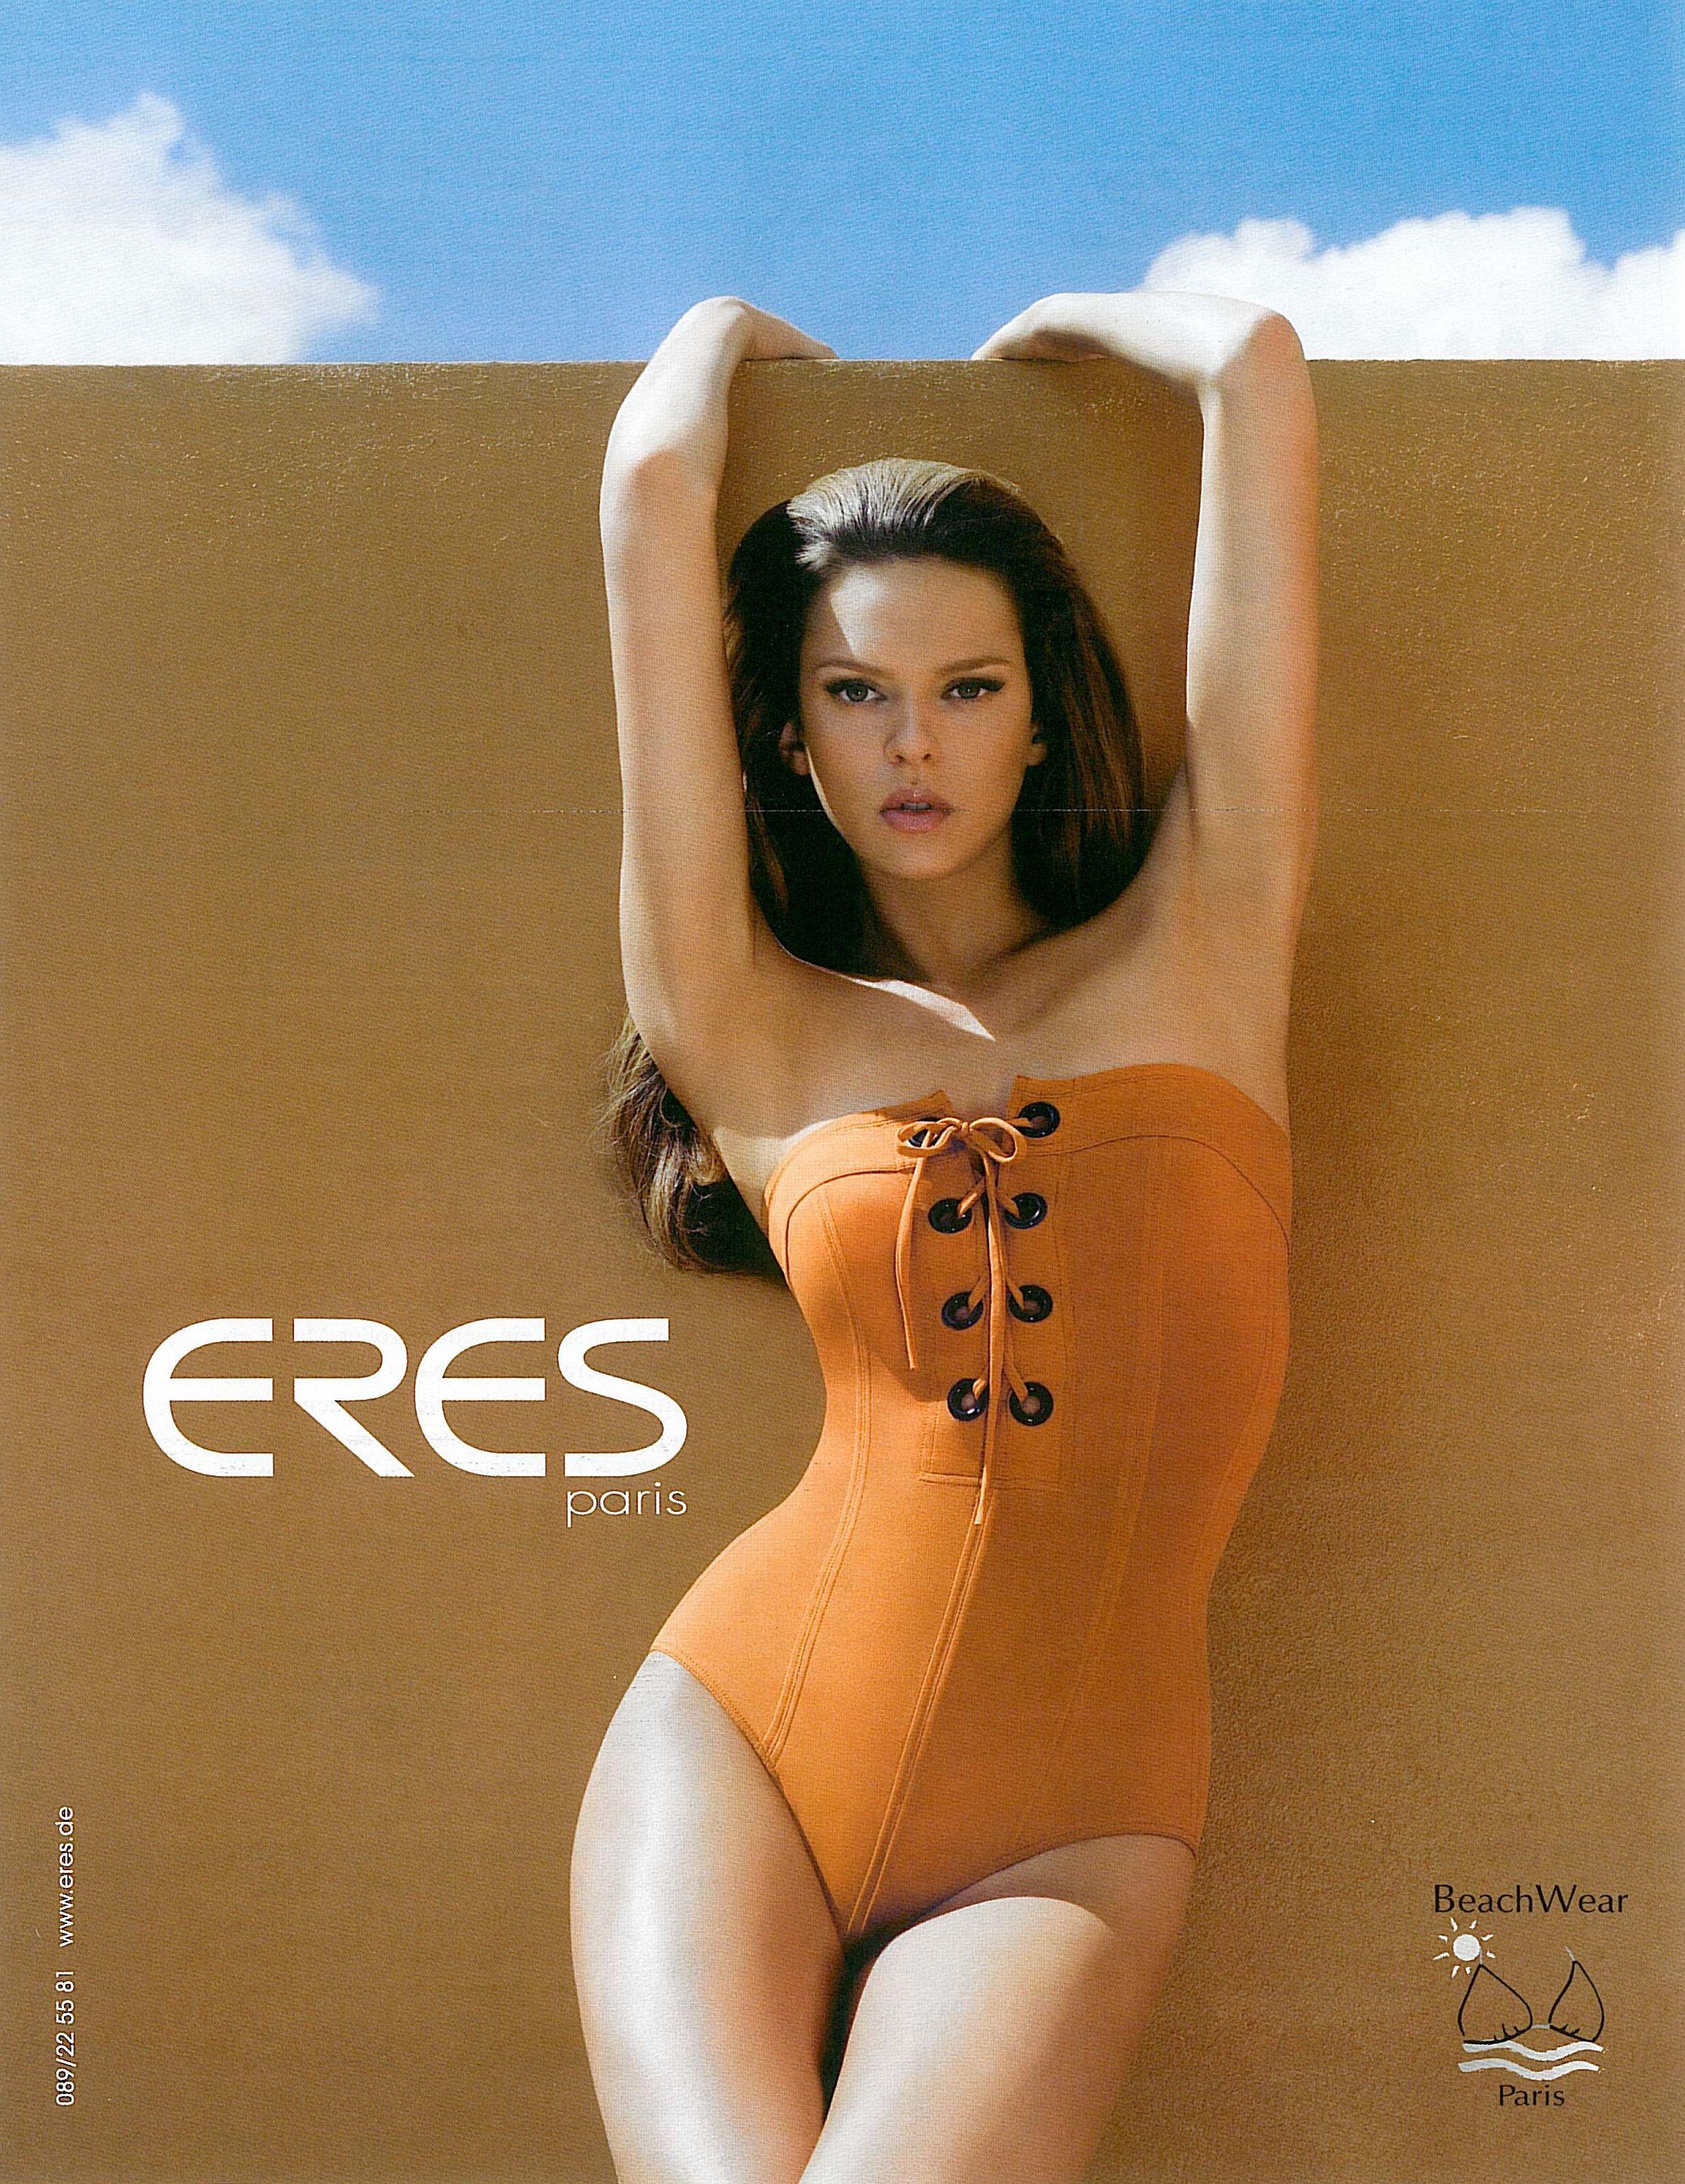 d86075b042 eres paris - love this swimwear brand | Inspiration | Beauté